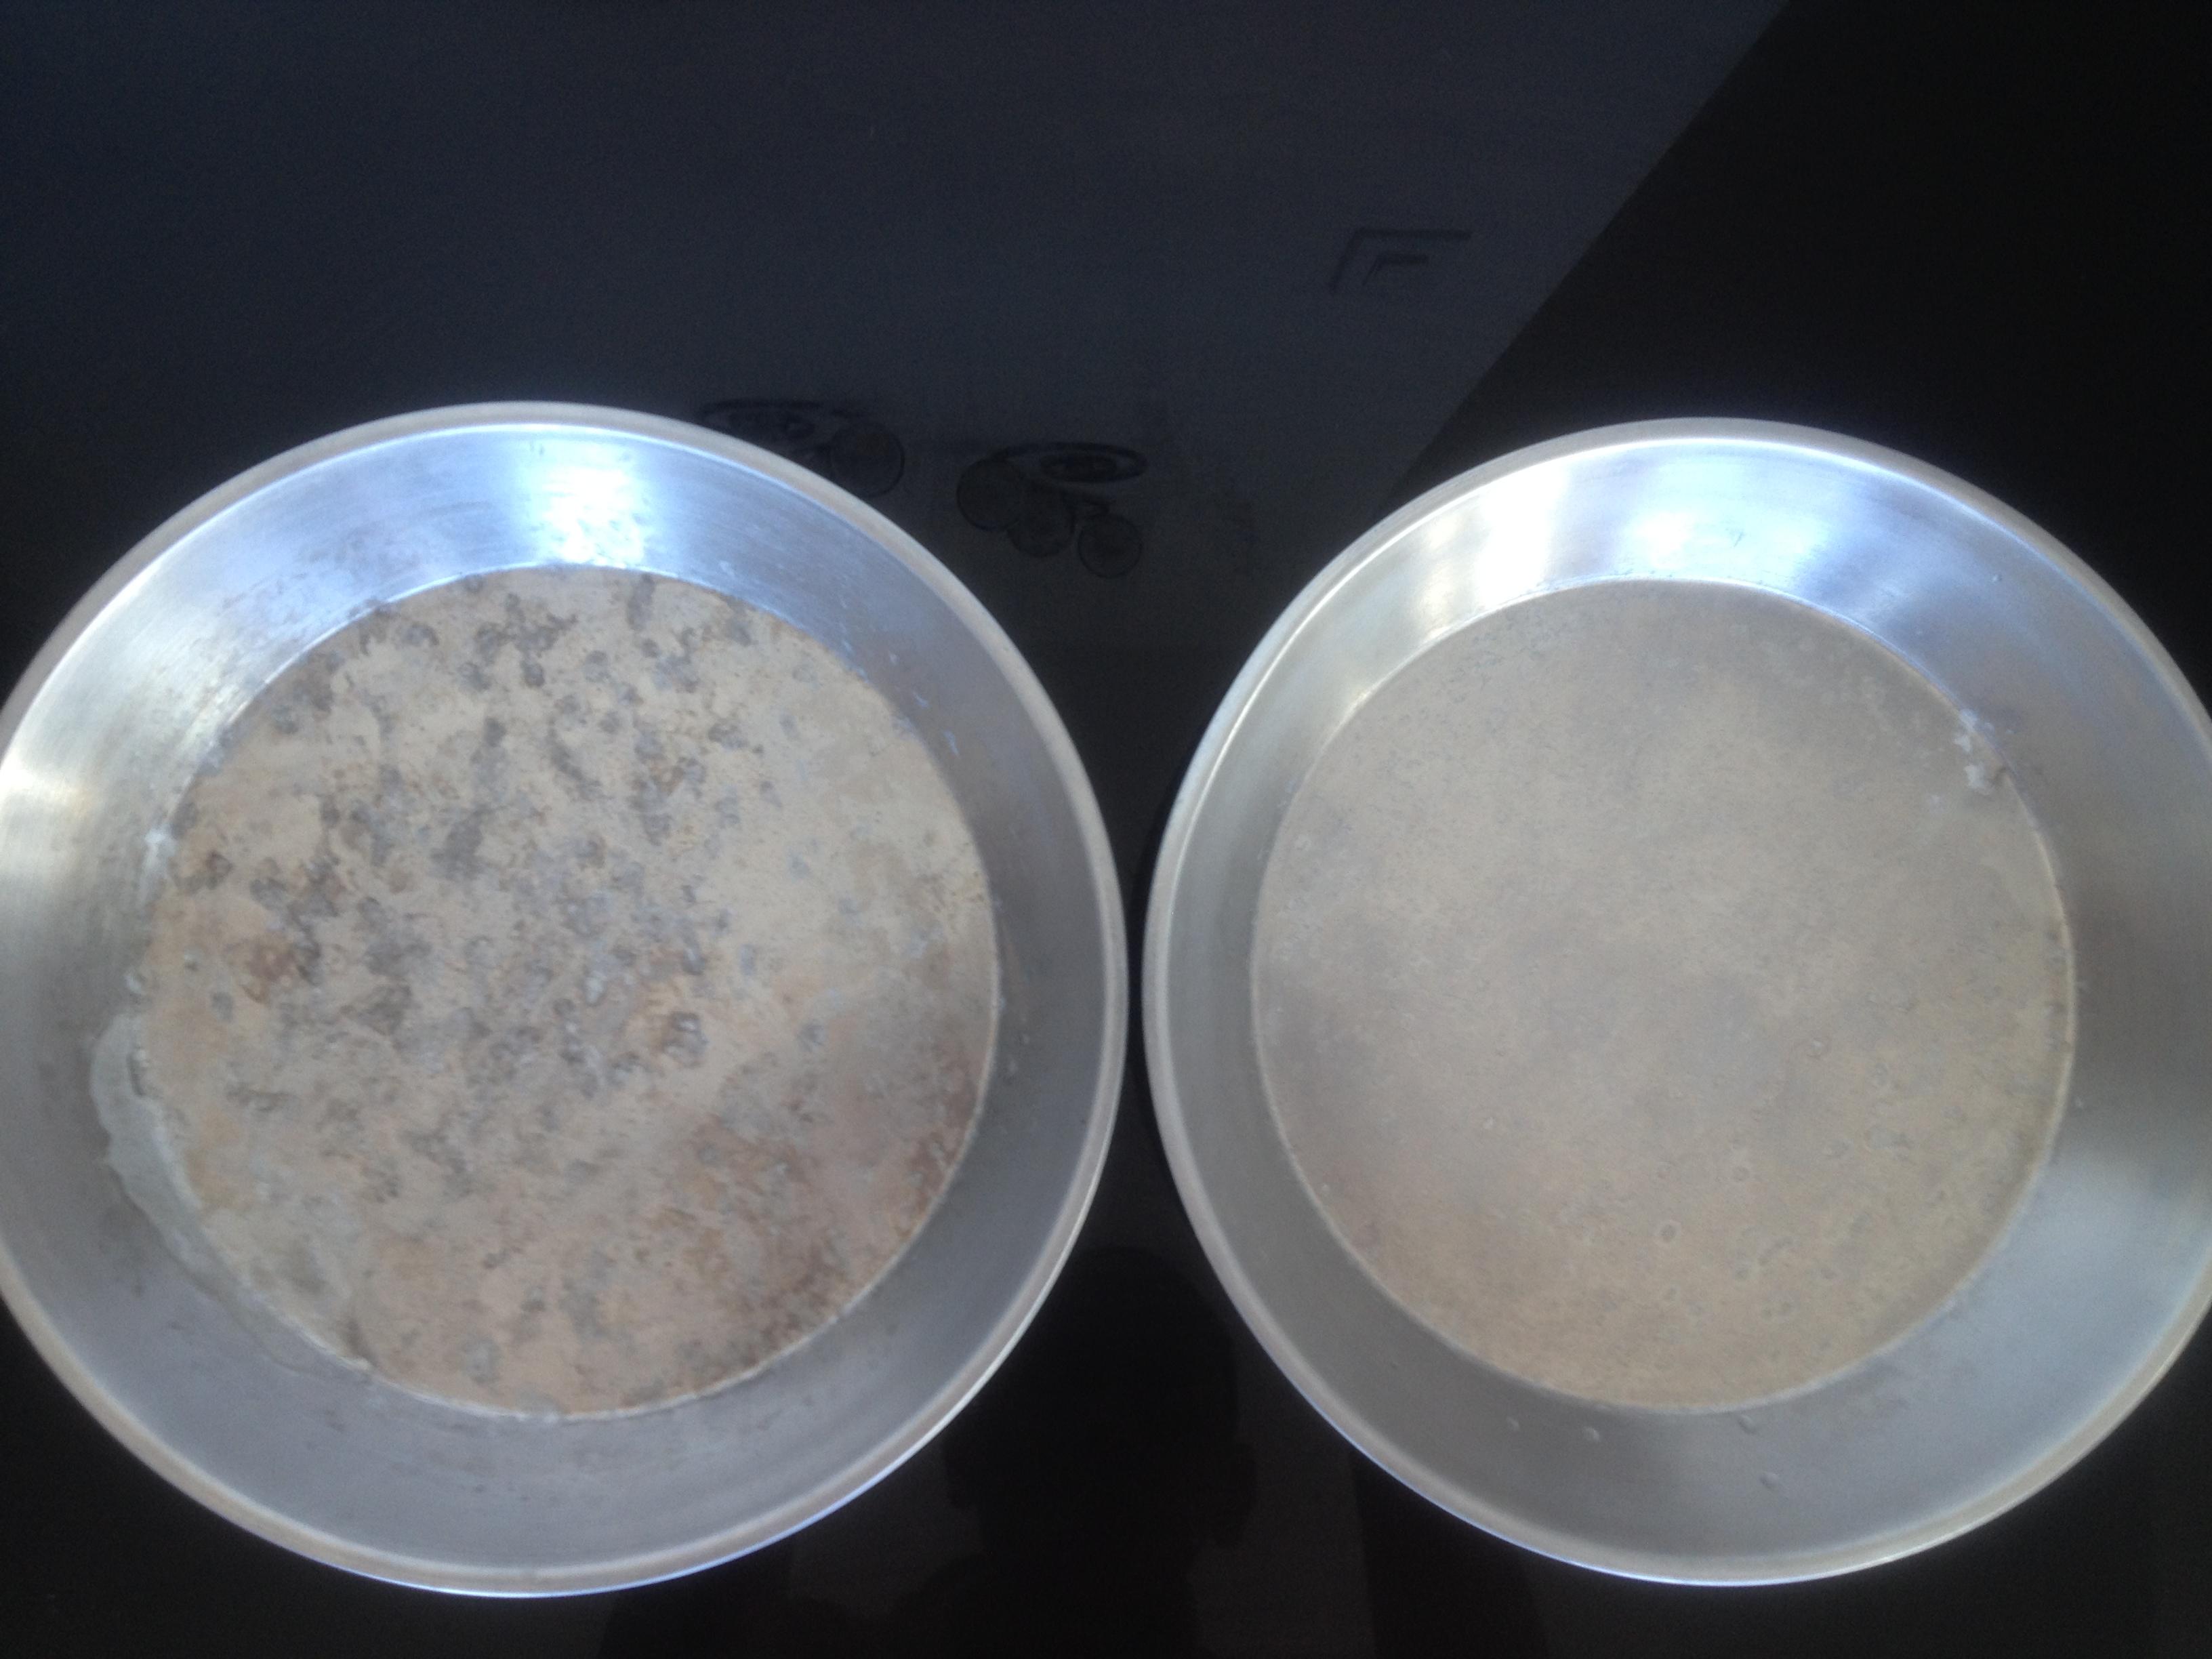 Homemade Iontophoresis Machine - Aluminium Pie